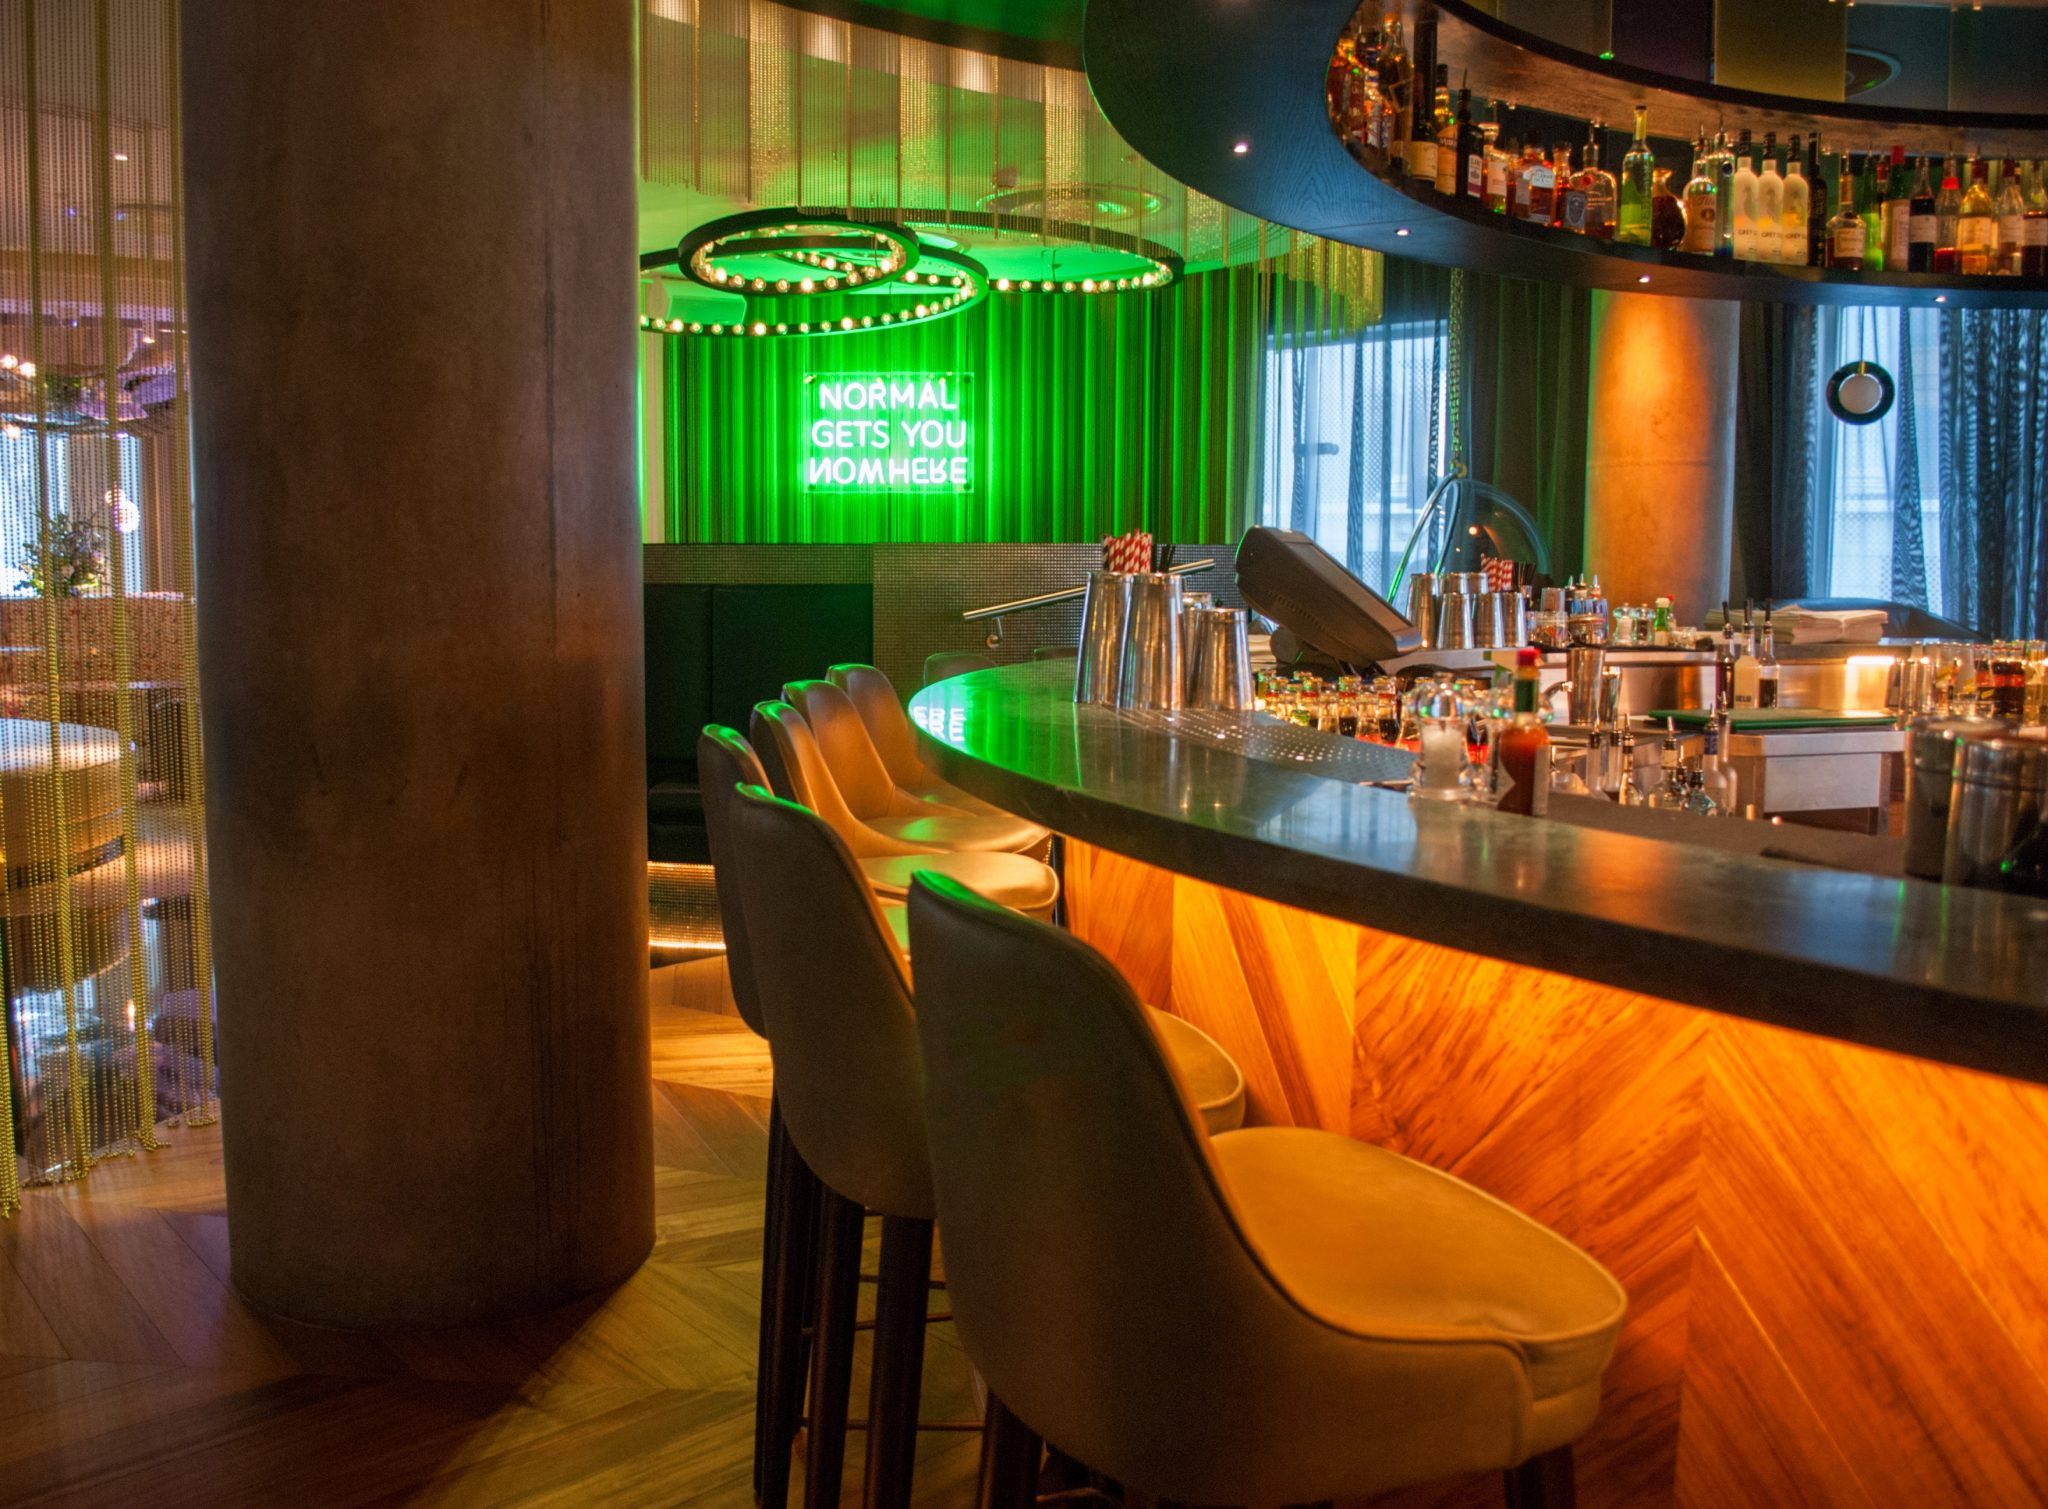 The W Hotel Bar stools